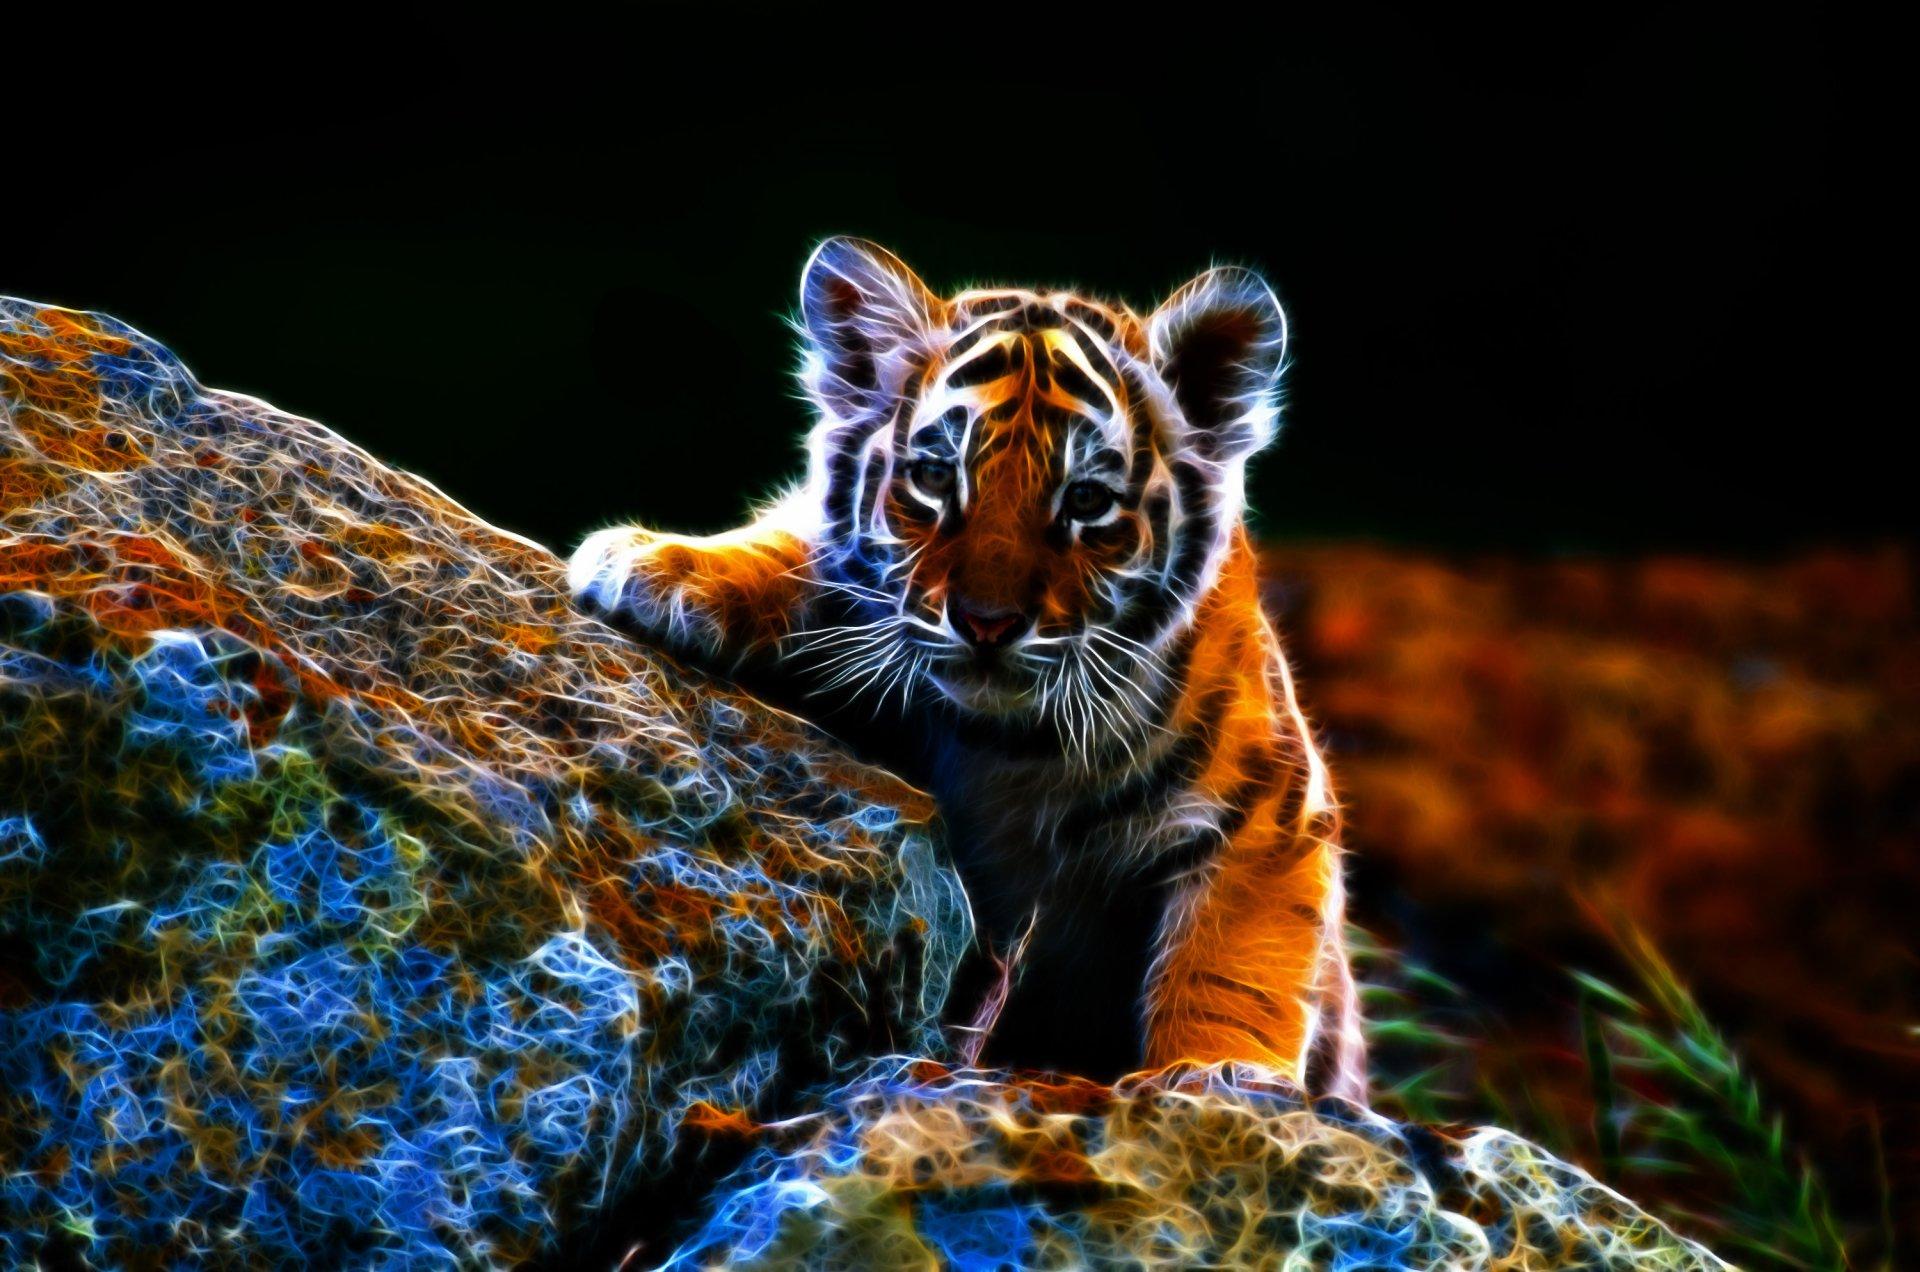 Tiger HD Wallpaper | Background Image | 3000x1988 | ID ...